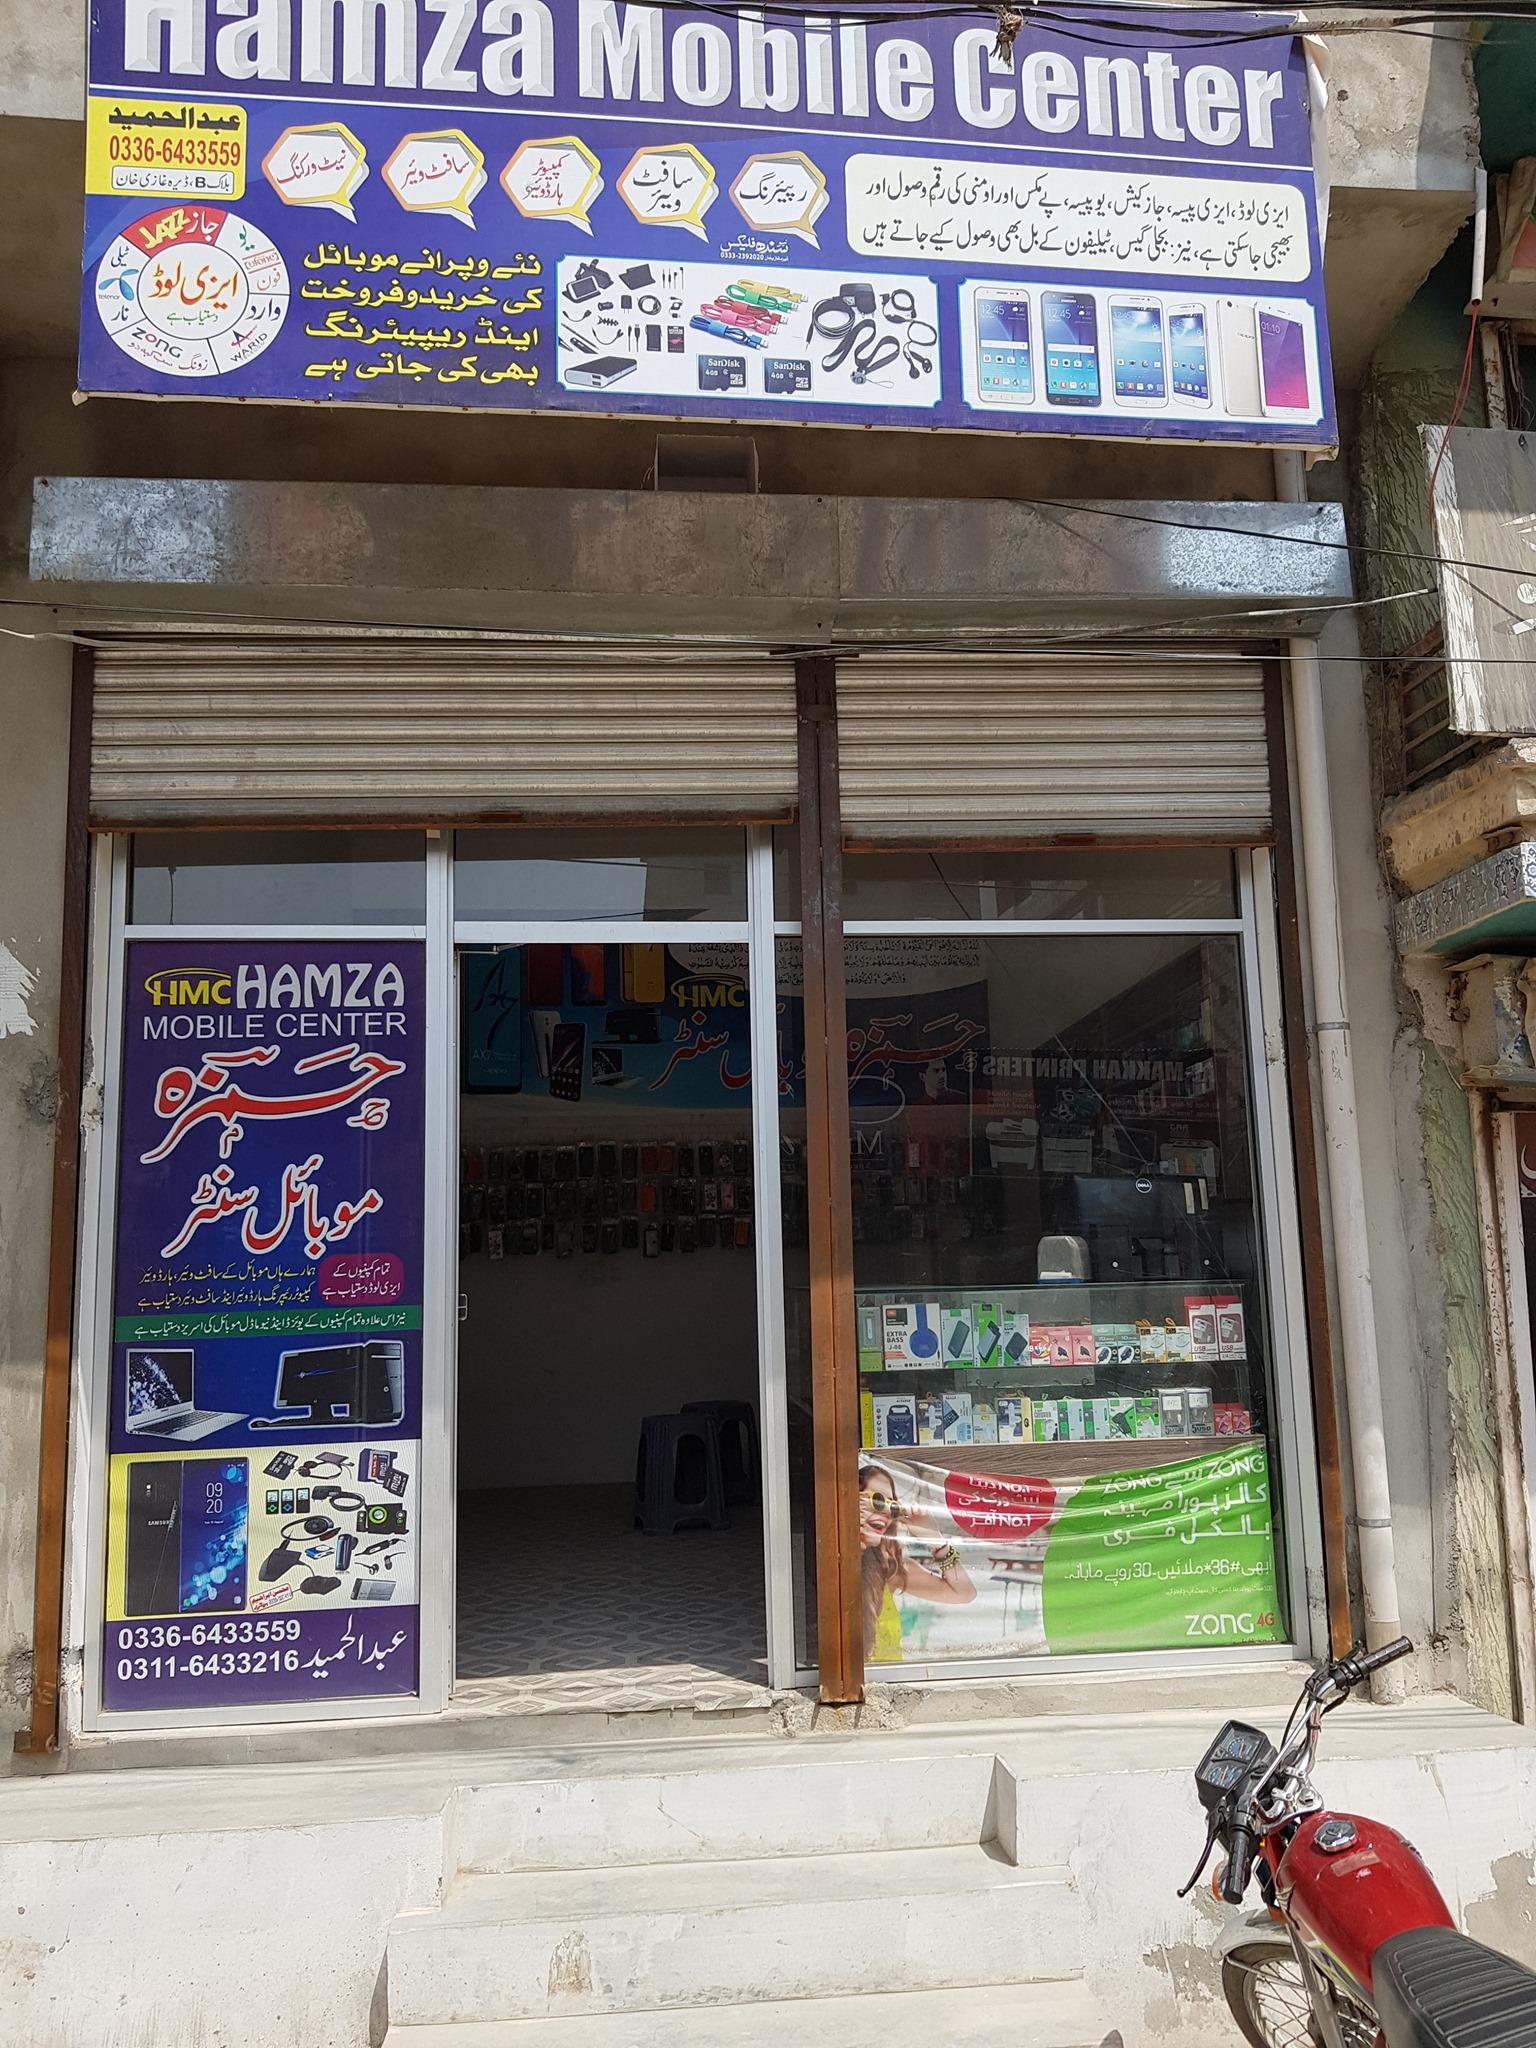 Hamza Mobile Center shop cover